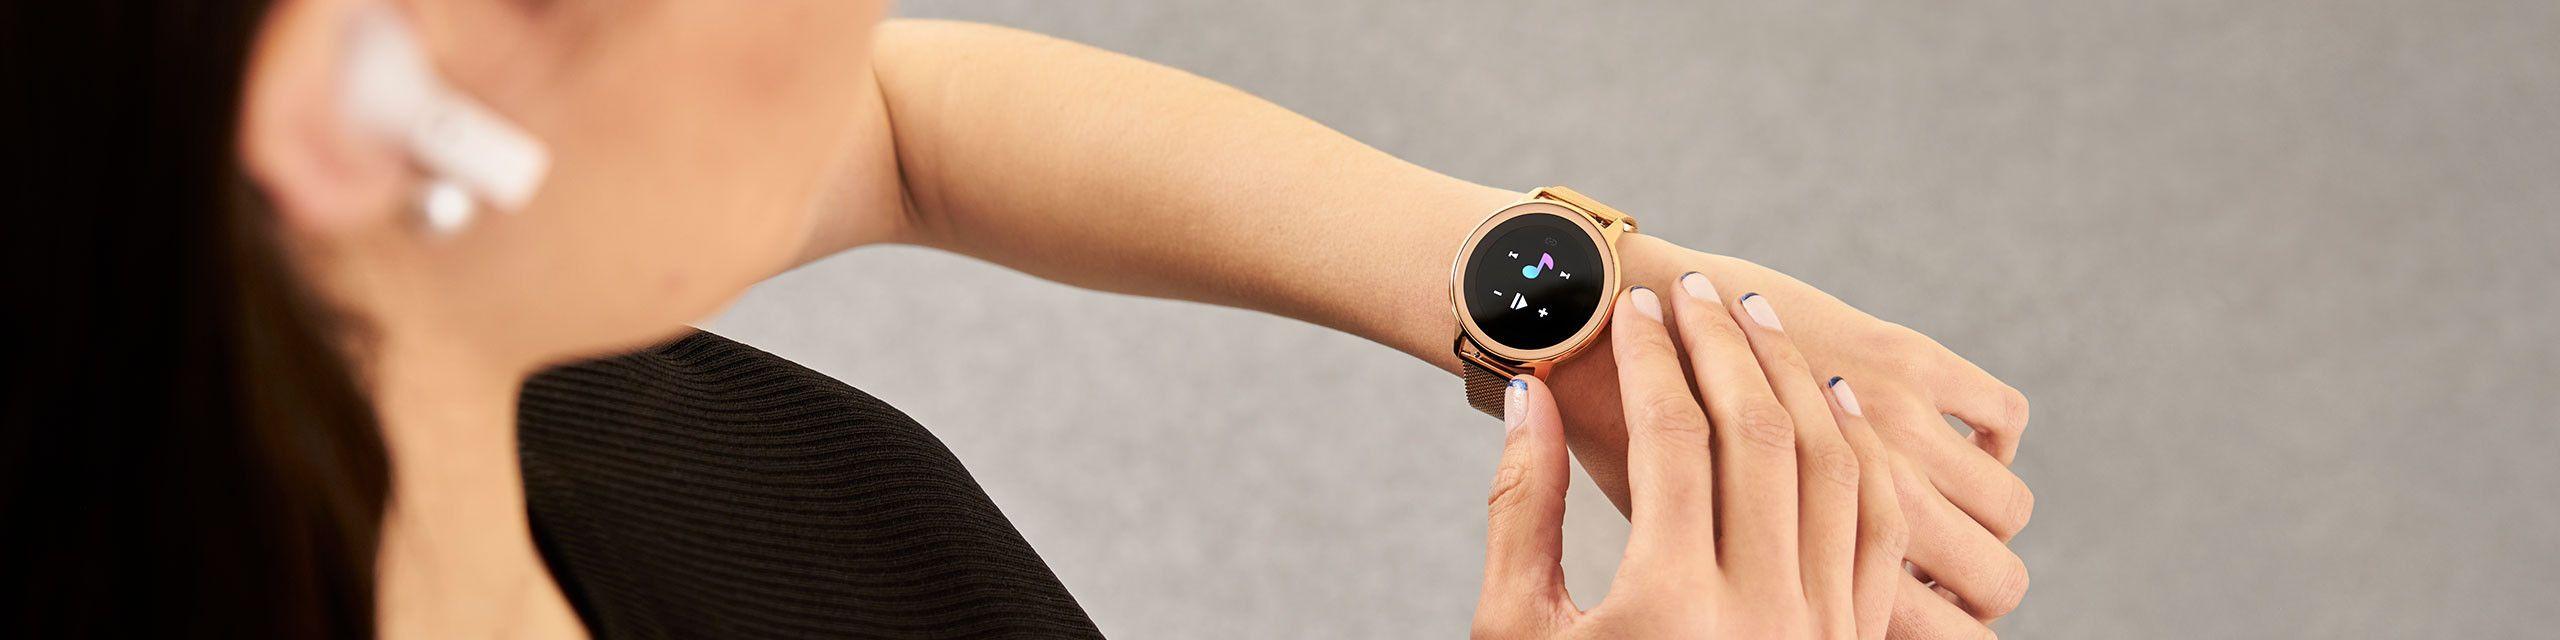 Relógios inteligentes ▷ Smartwatches ⌚- Radiant Portugal